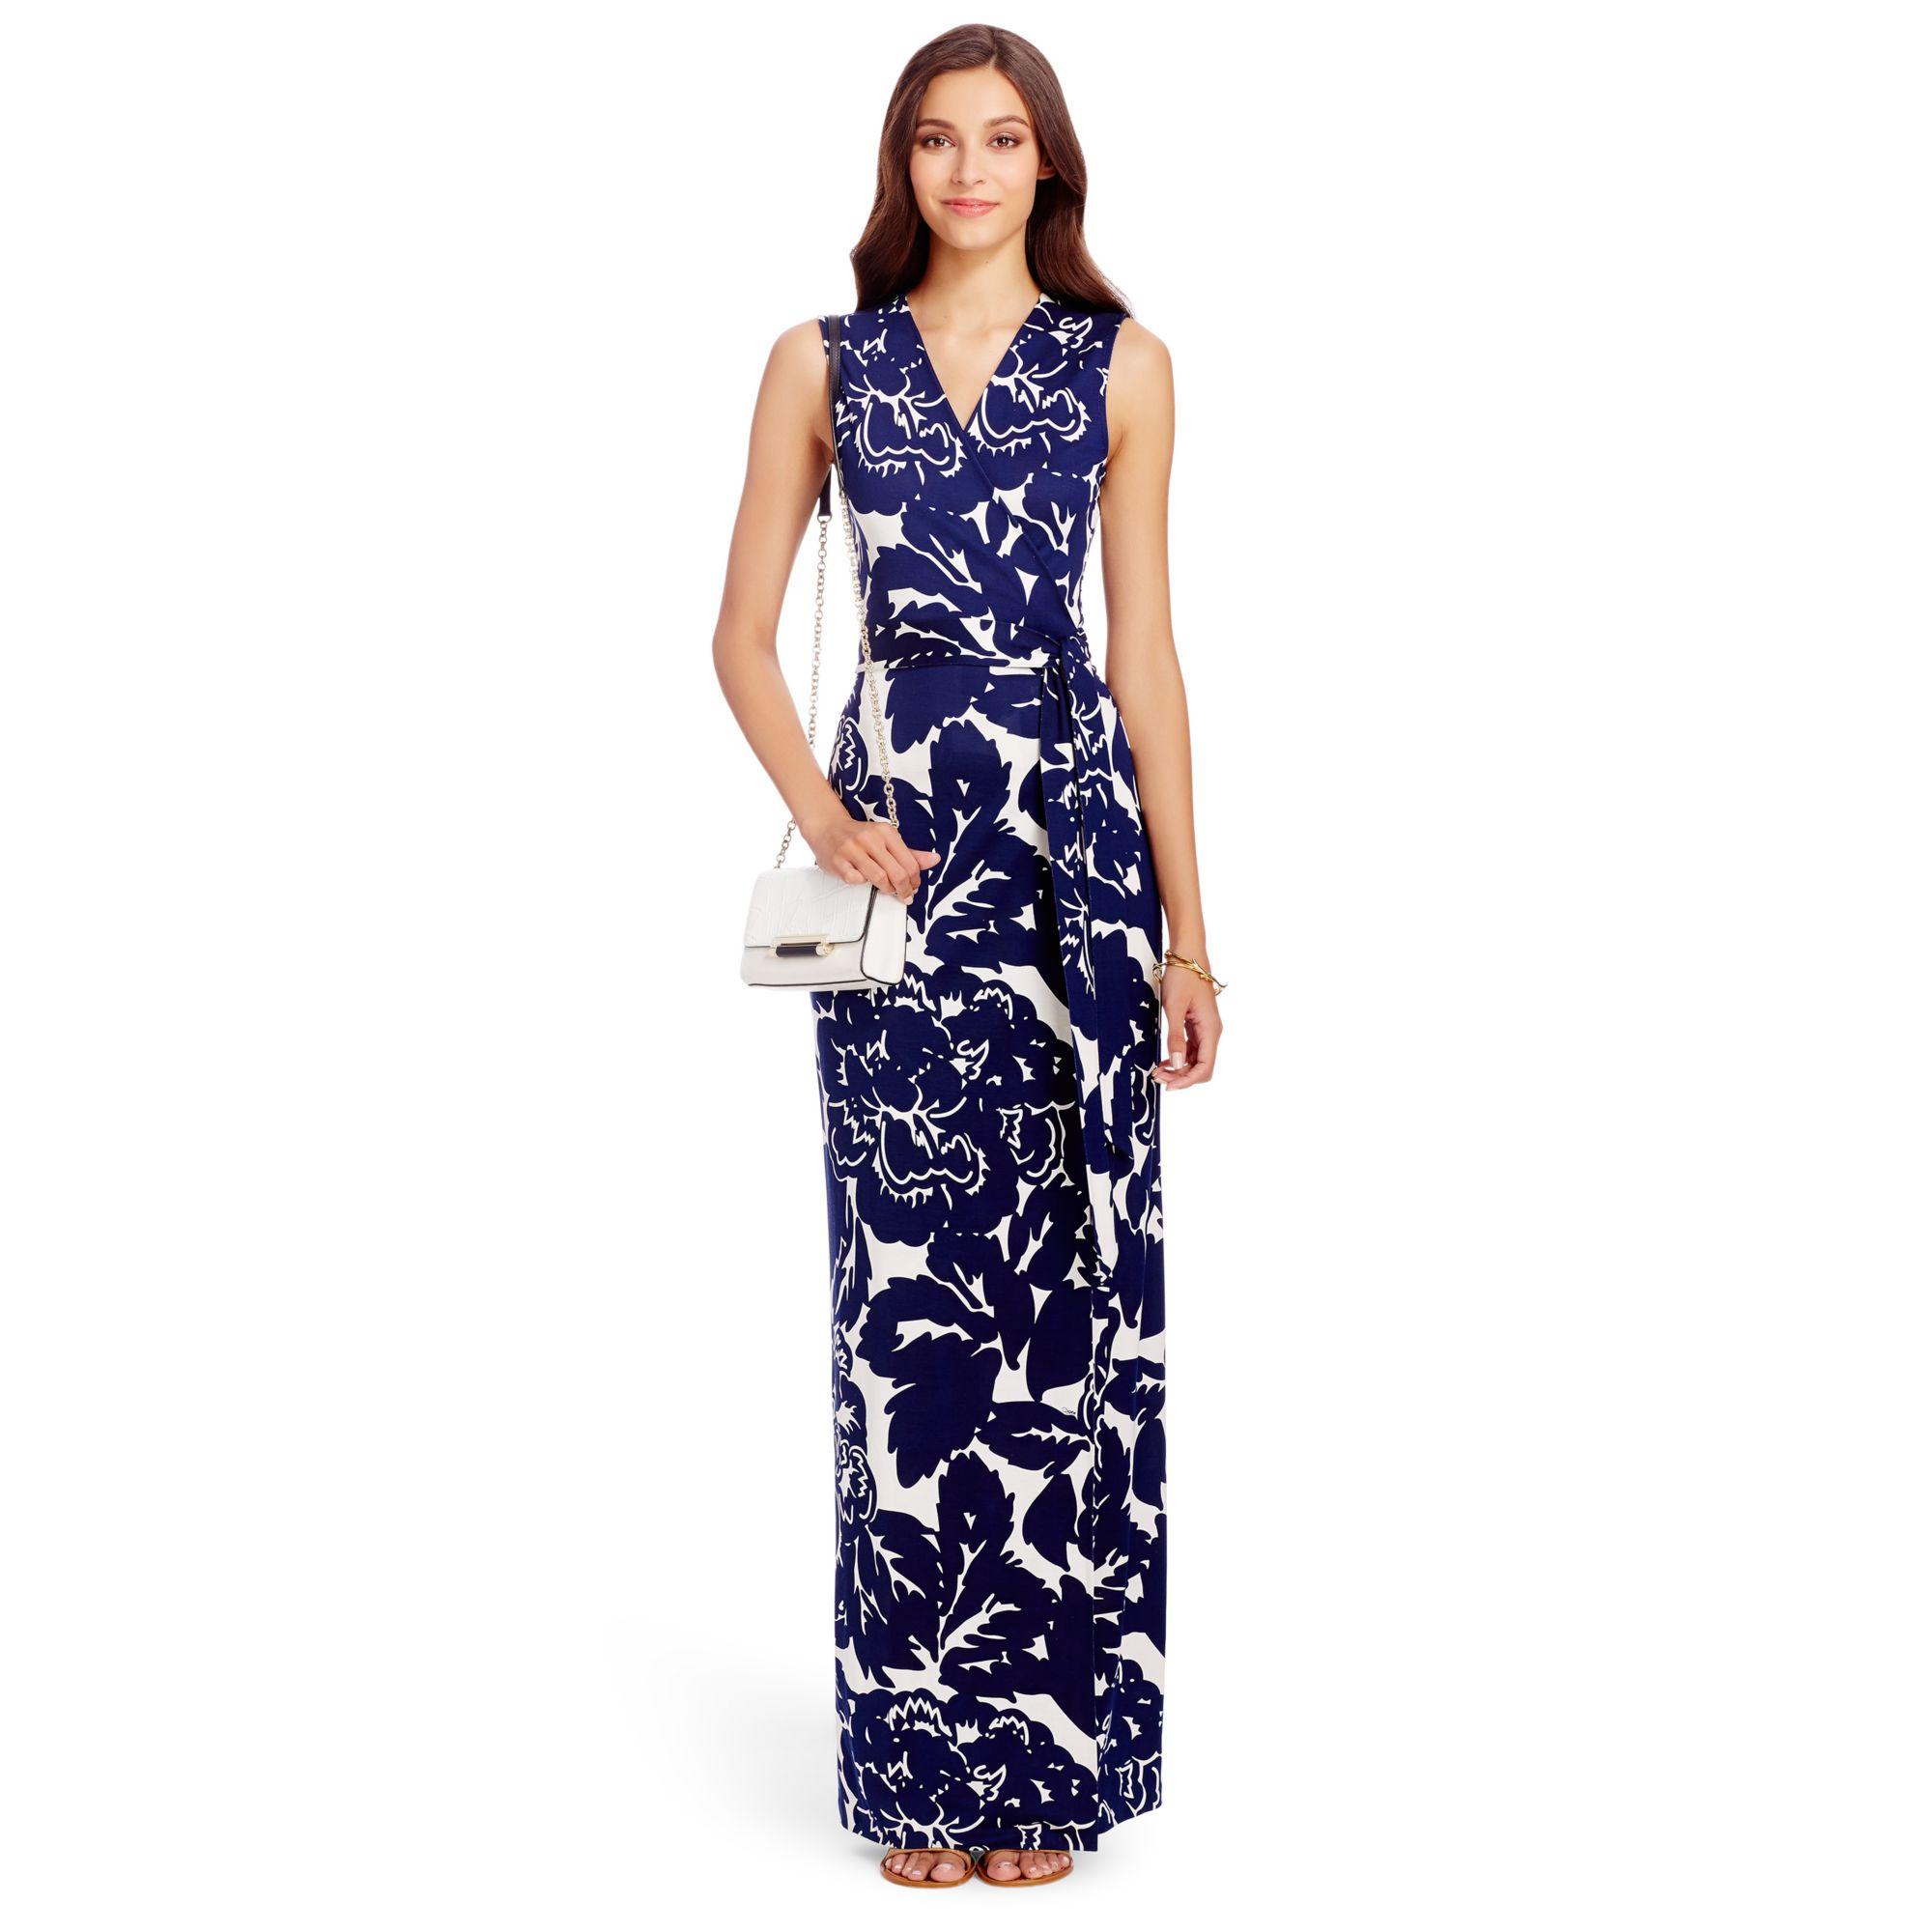 Diane von furstenberg maxi dresses